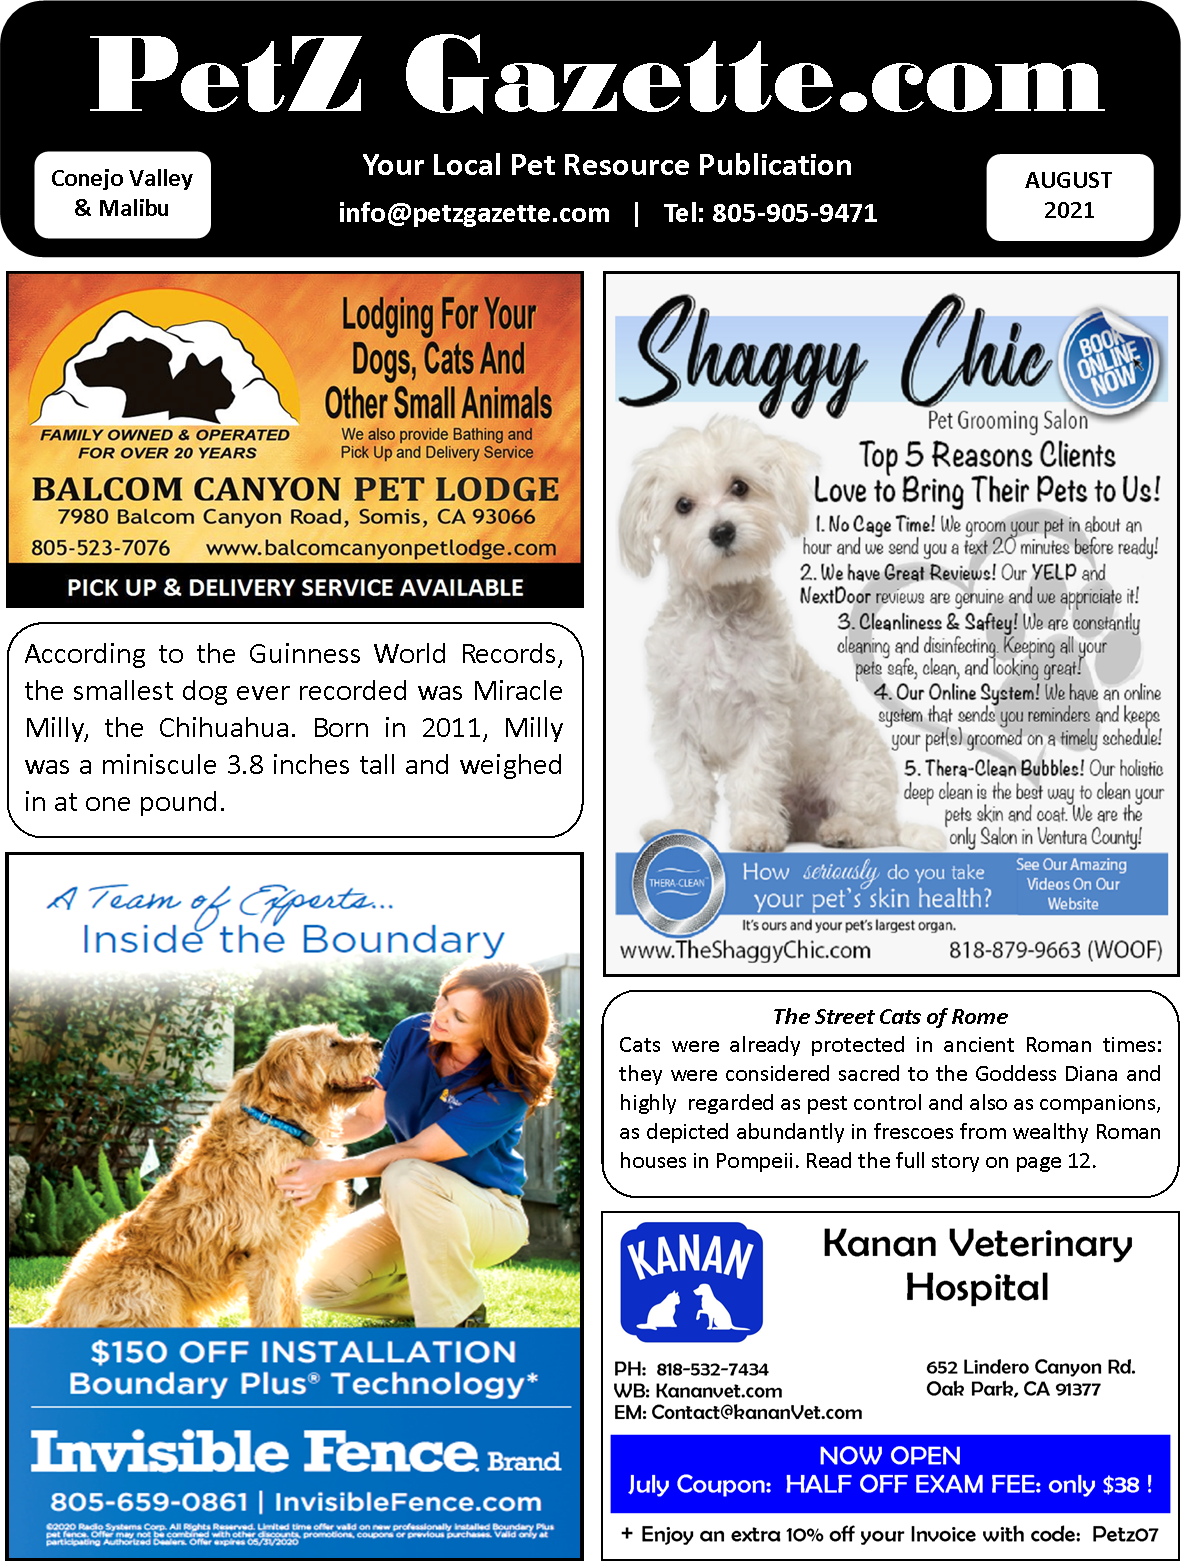 Conejo Valley & Malibu | AUGUST 2021